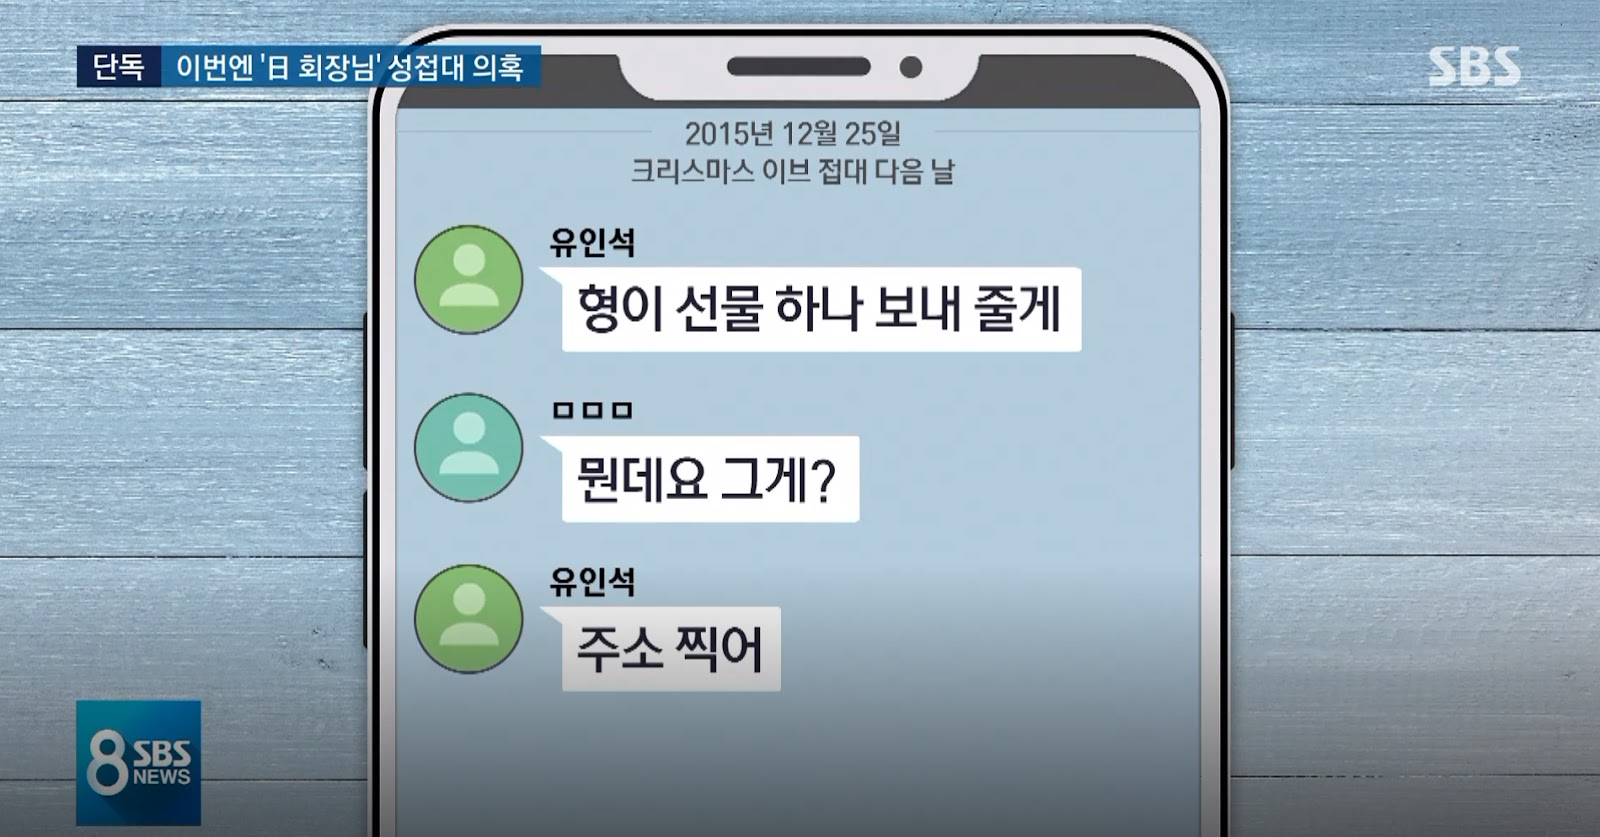 seungri ss 5